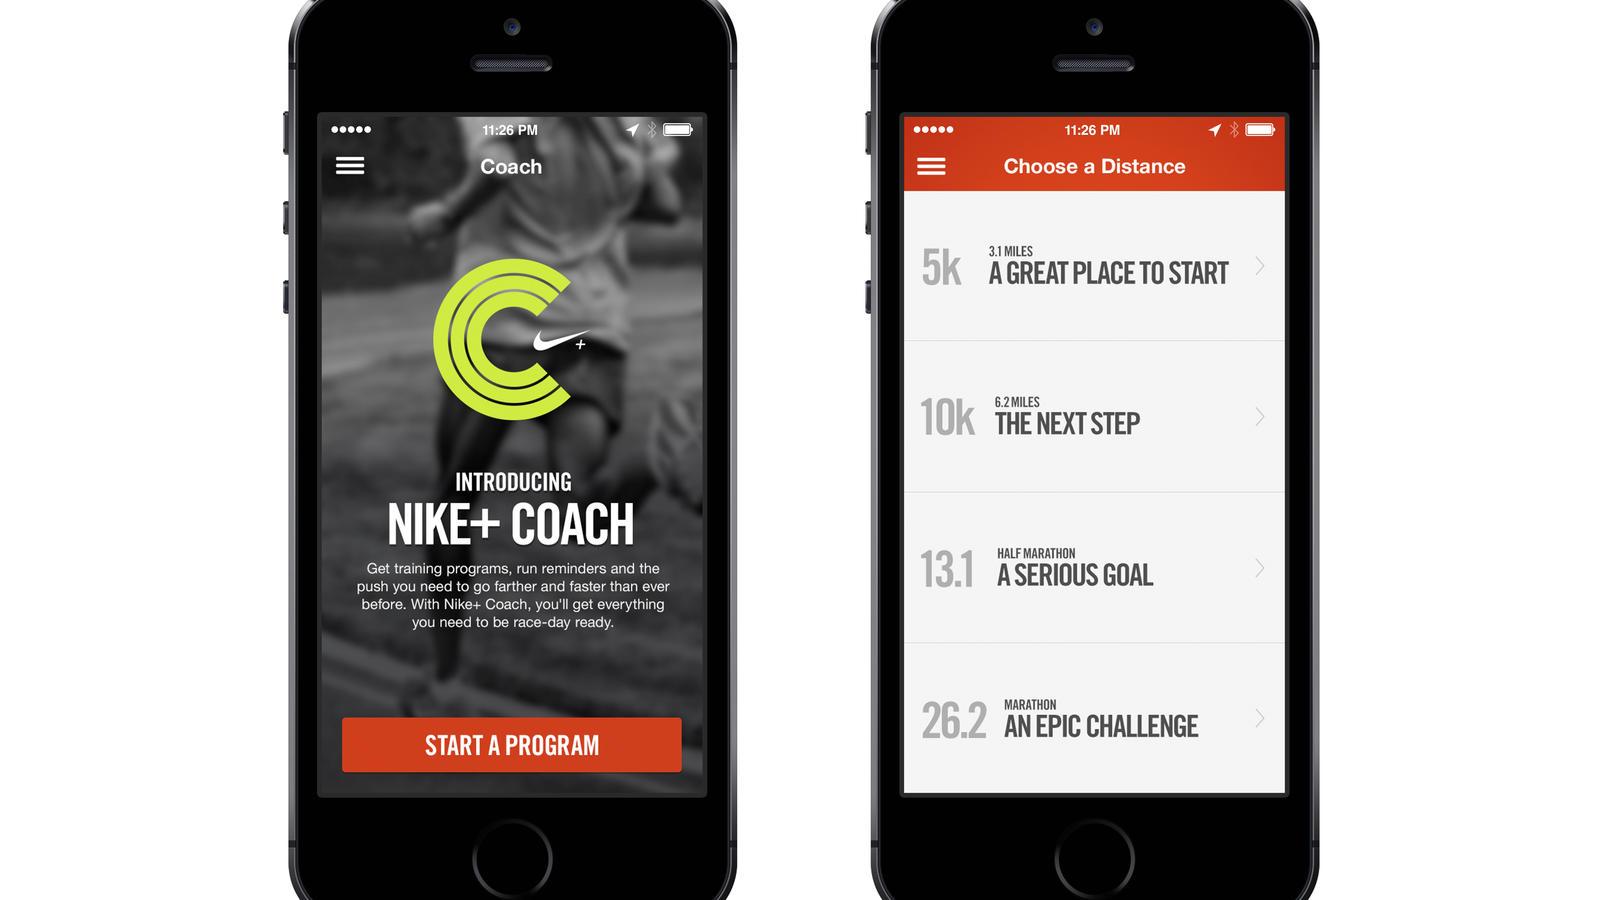 nike-plus-coach-lead-distance